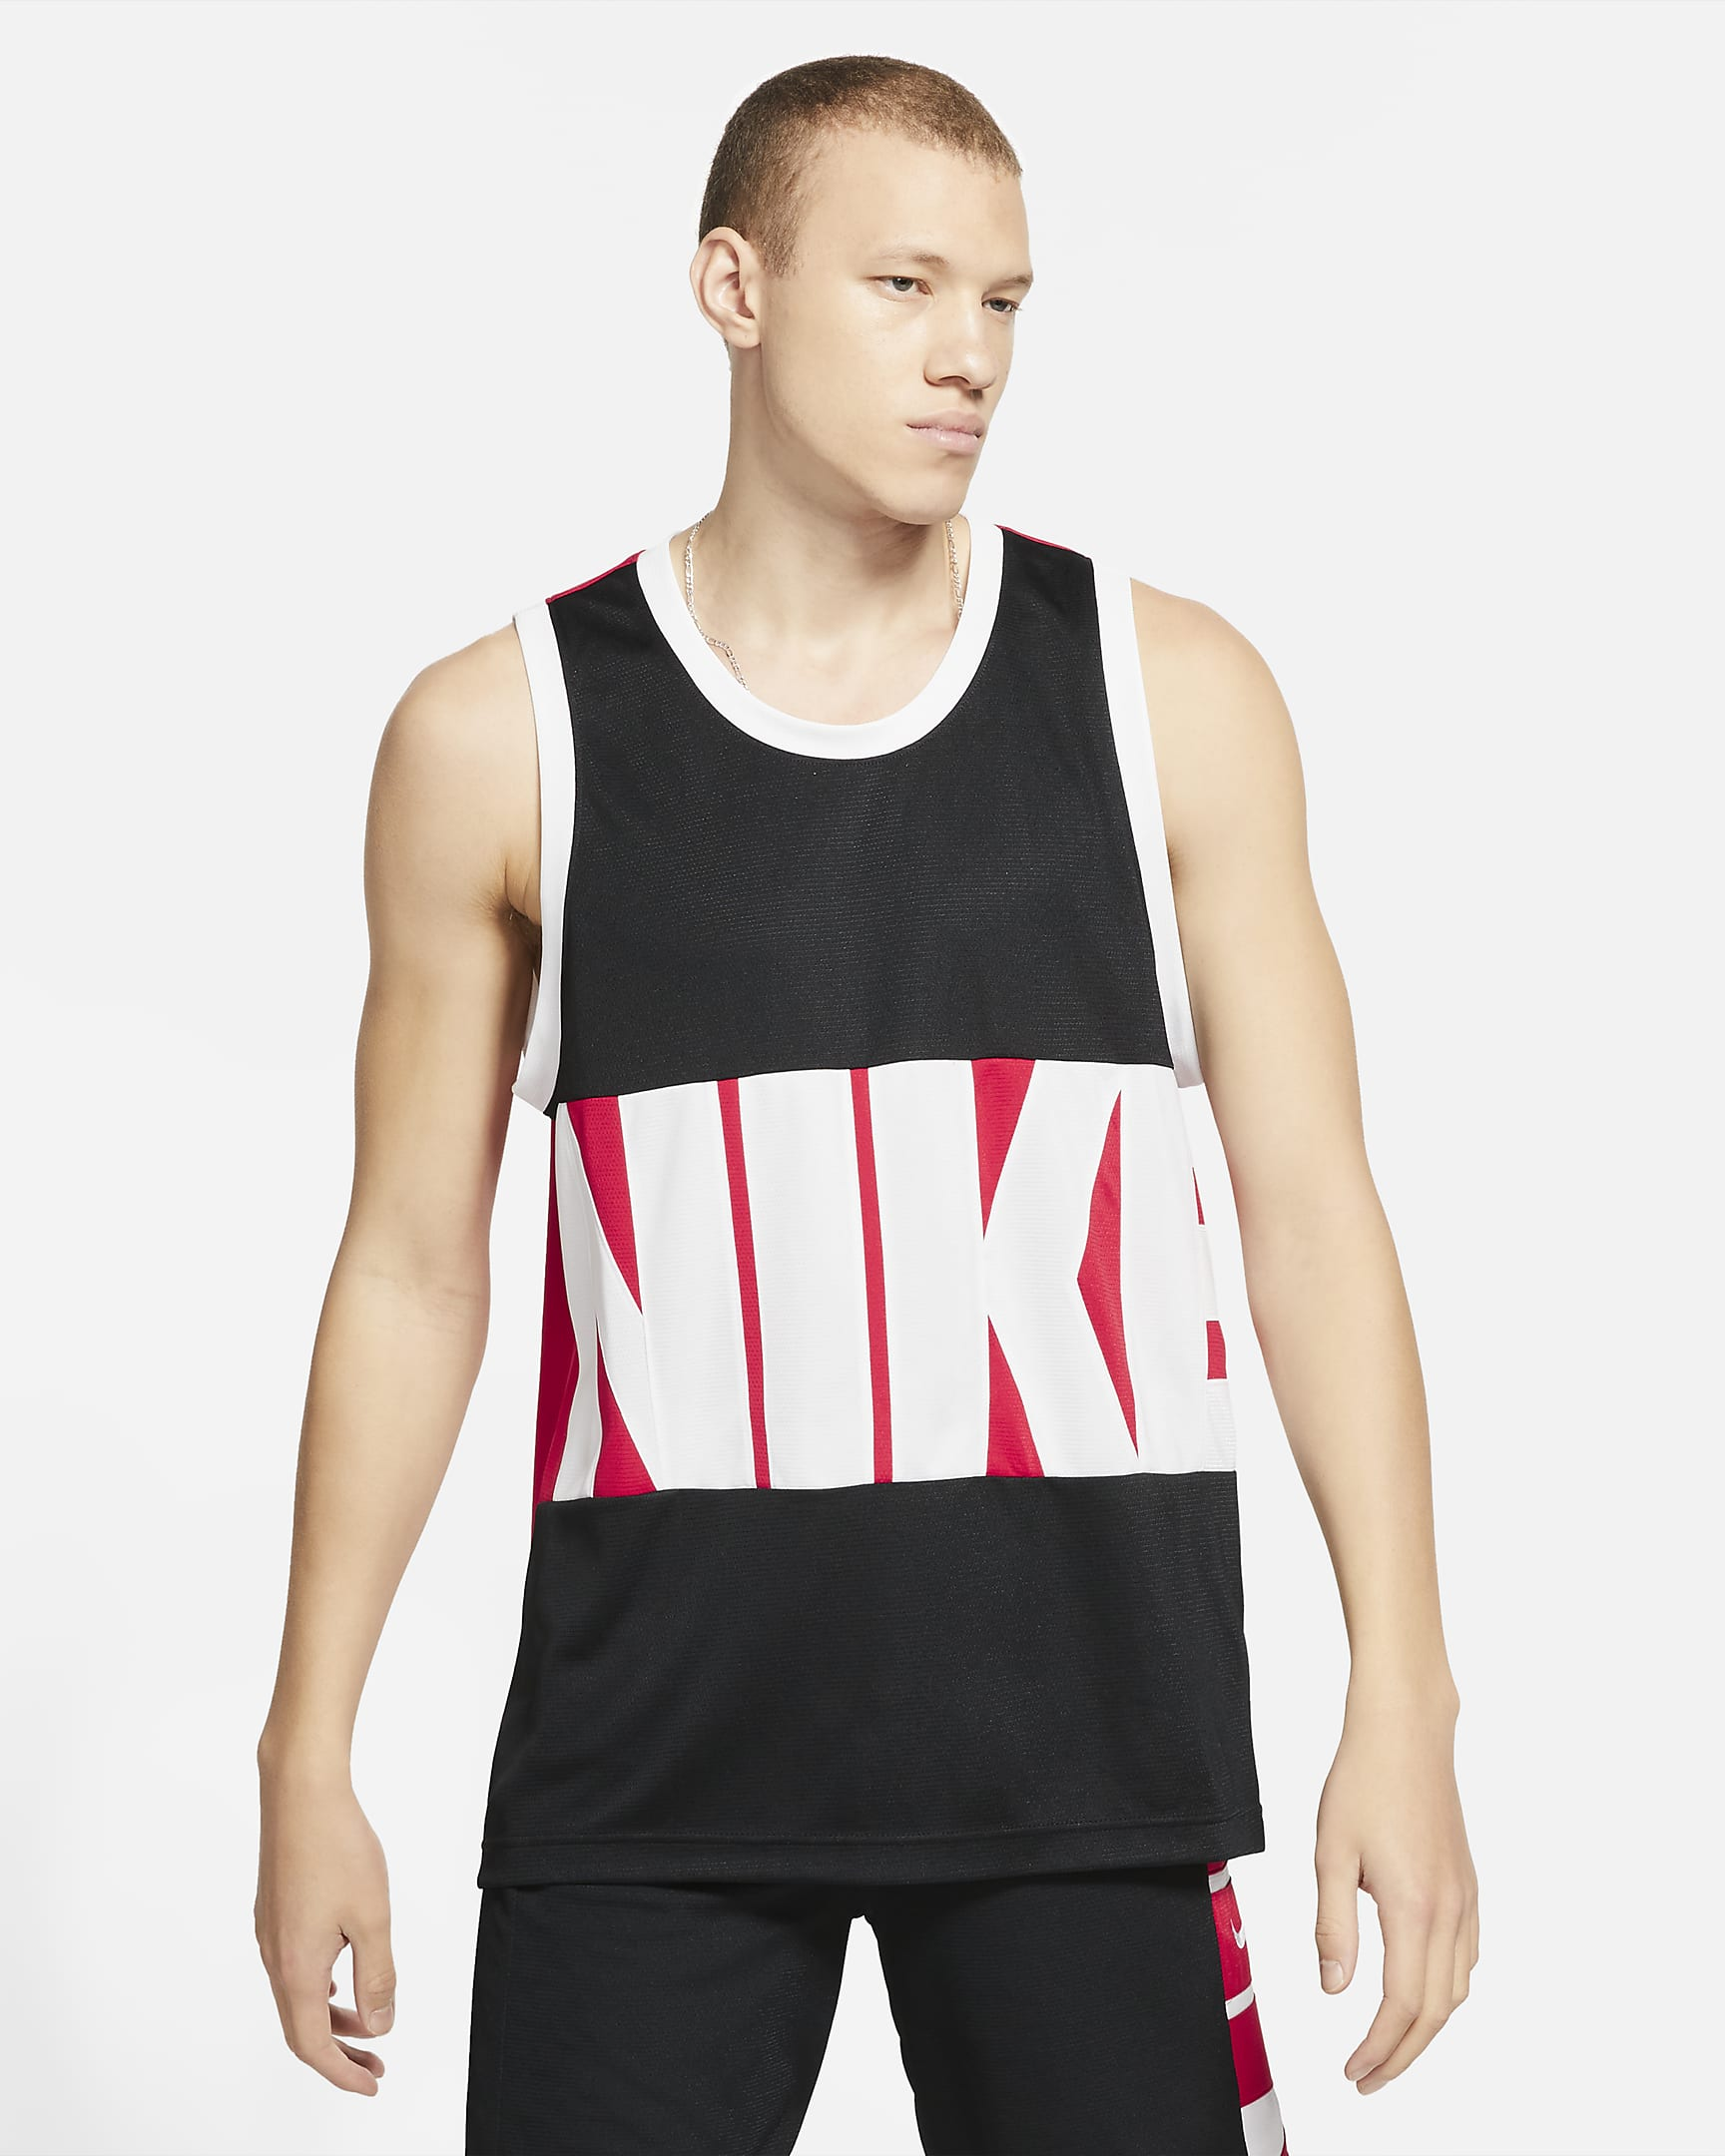 dri-fit-mens-basketball-jersey-T1qLCl